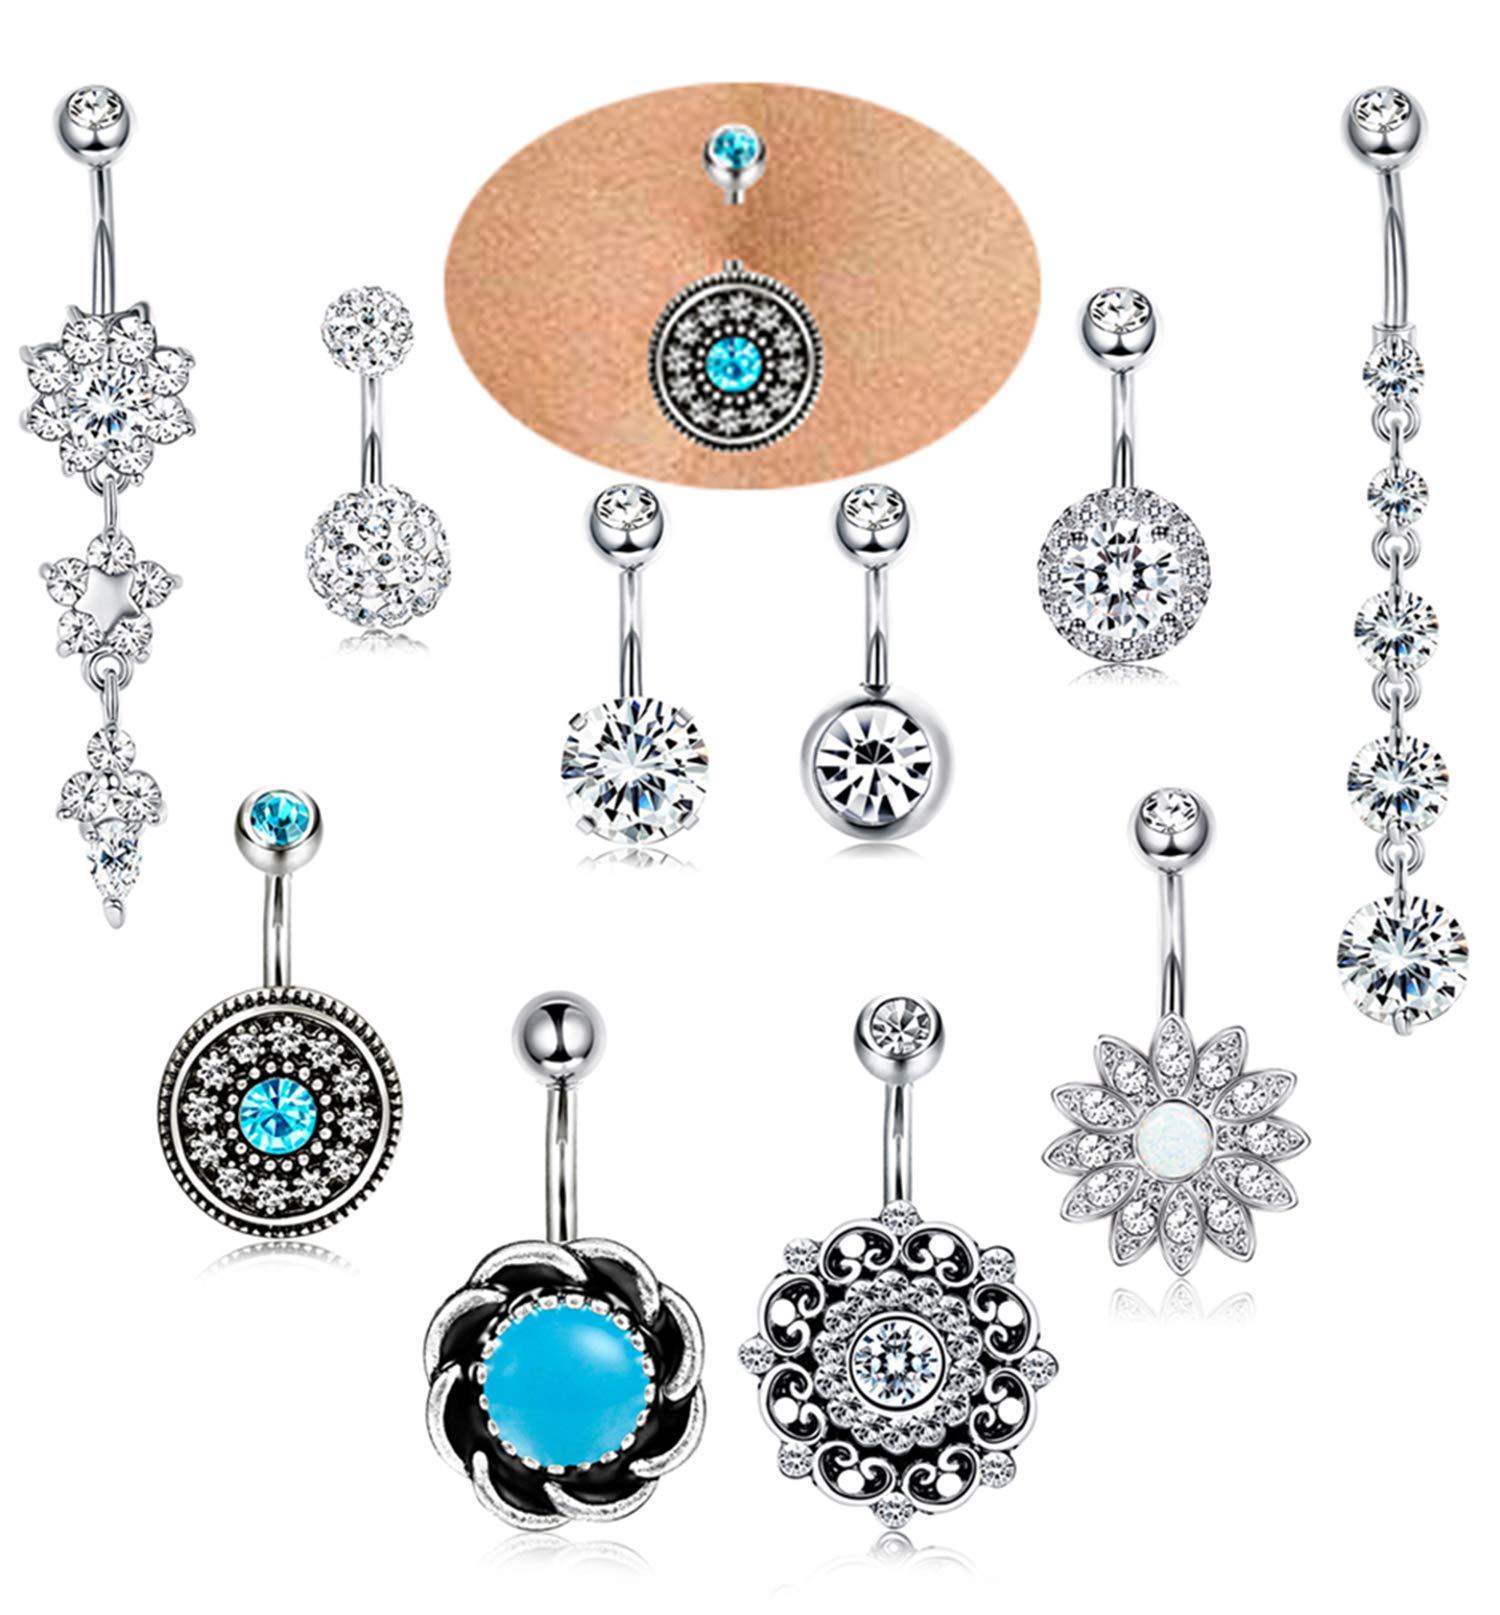 ORAZIO 10PCS 14G Stainless Steel Belly Button Rings Women Girls Navel Rings CZ Opal Barbell Body Piercing Jewelry (B:10PCS Silver Tone)